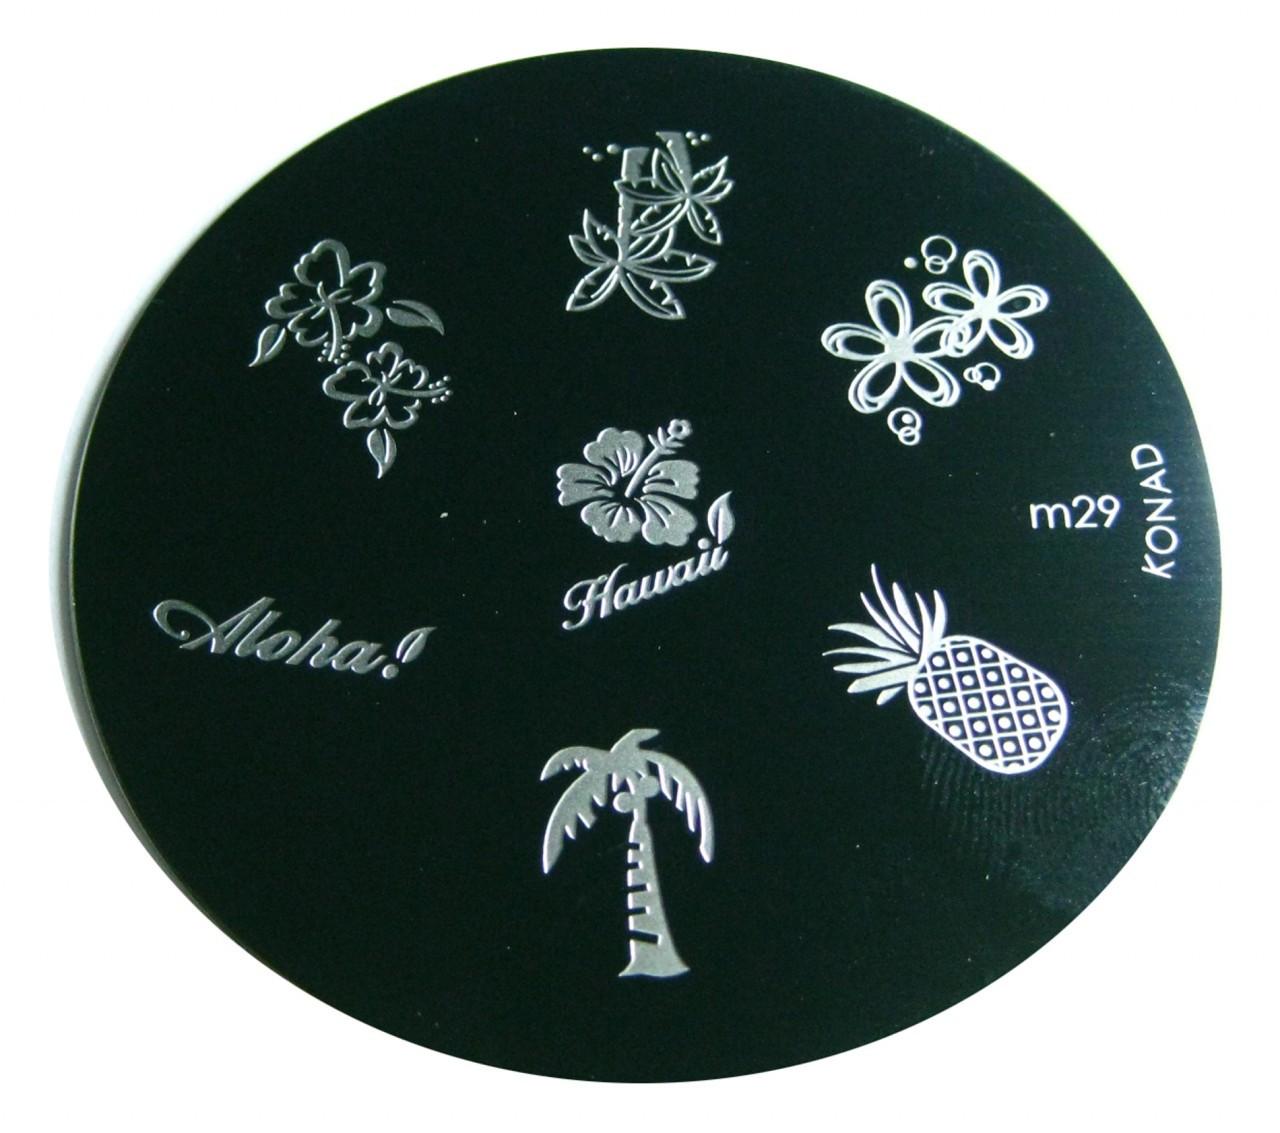 Image Plate M29 Hawaii Pineapple Tree Flower By Konad Nail Art